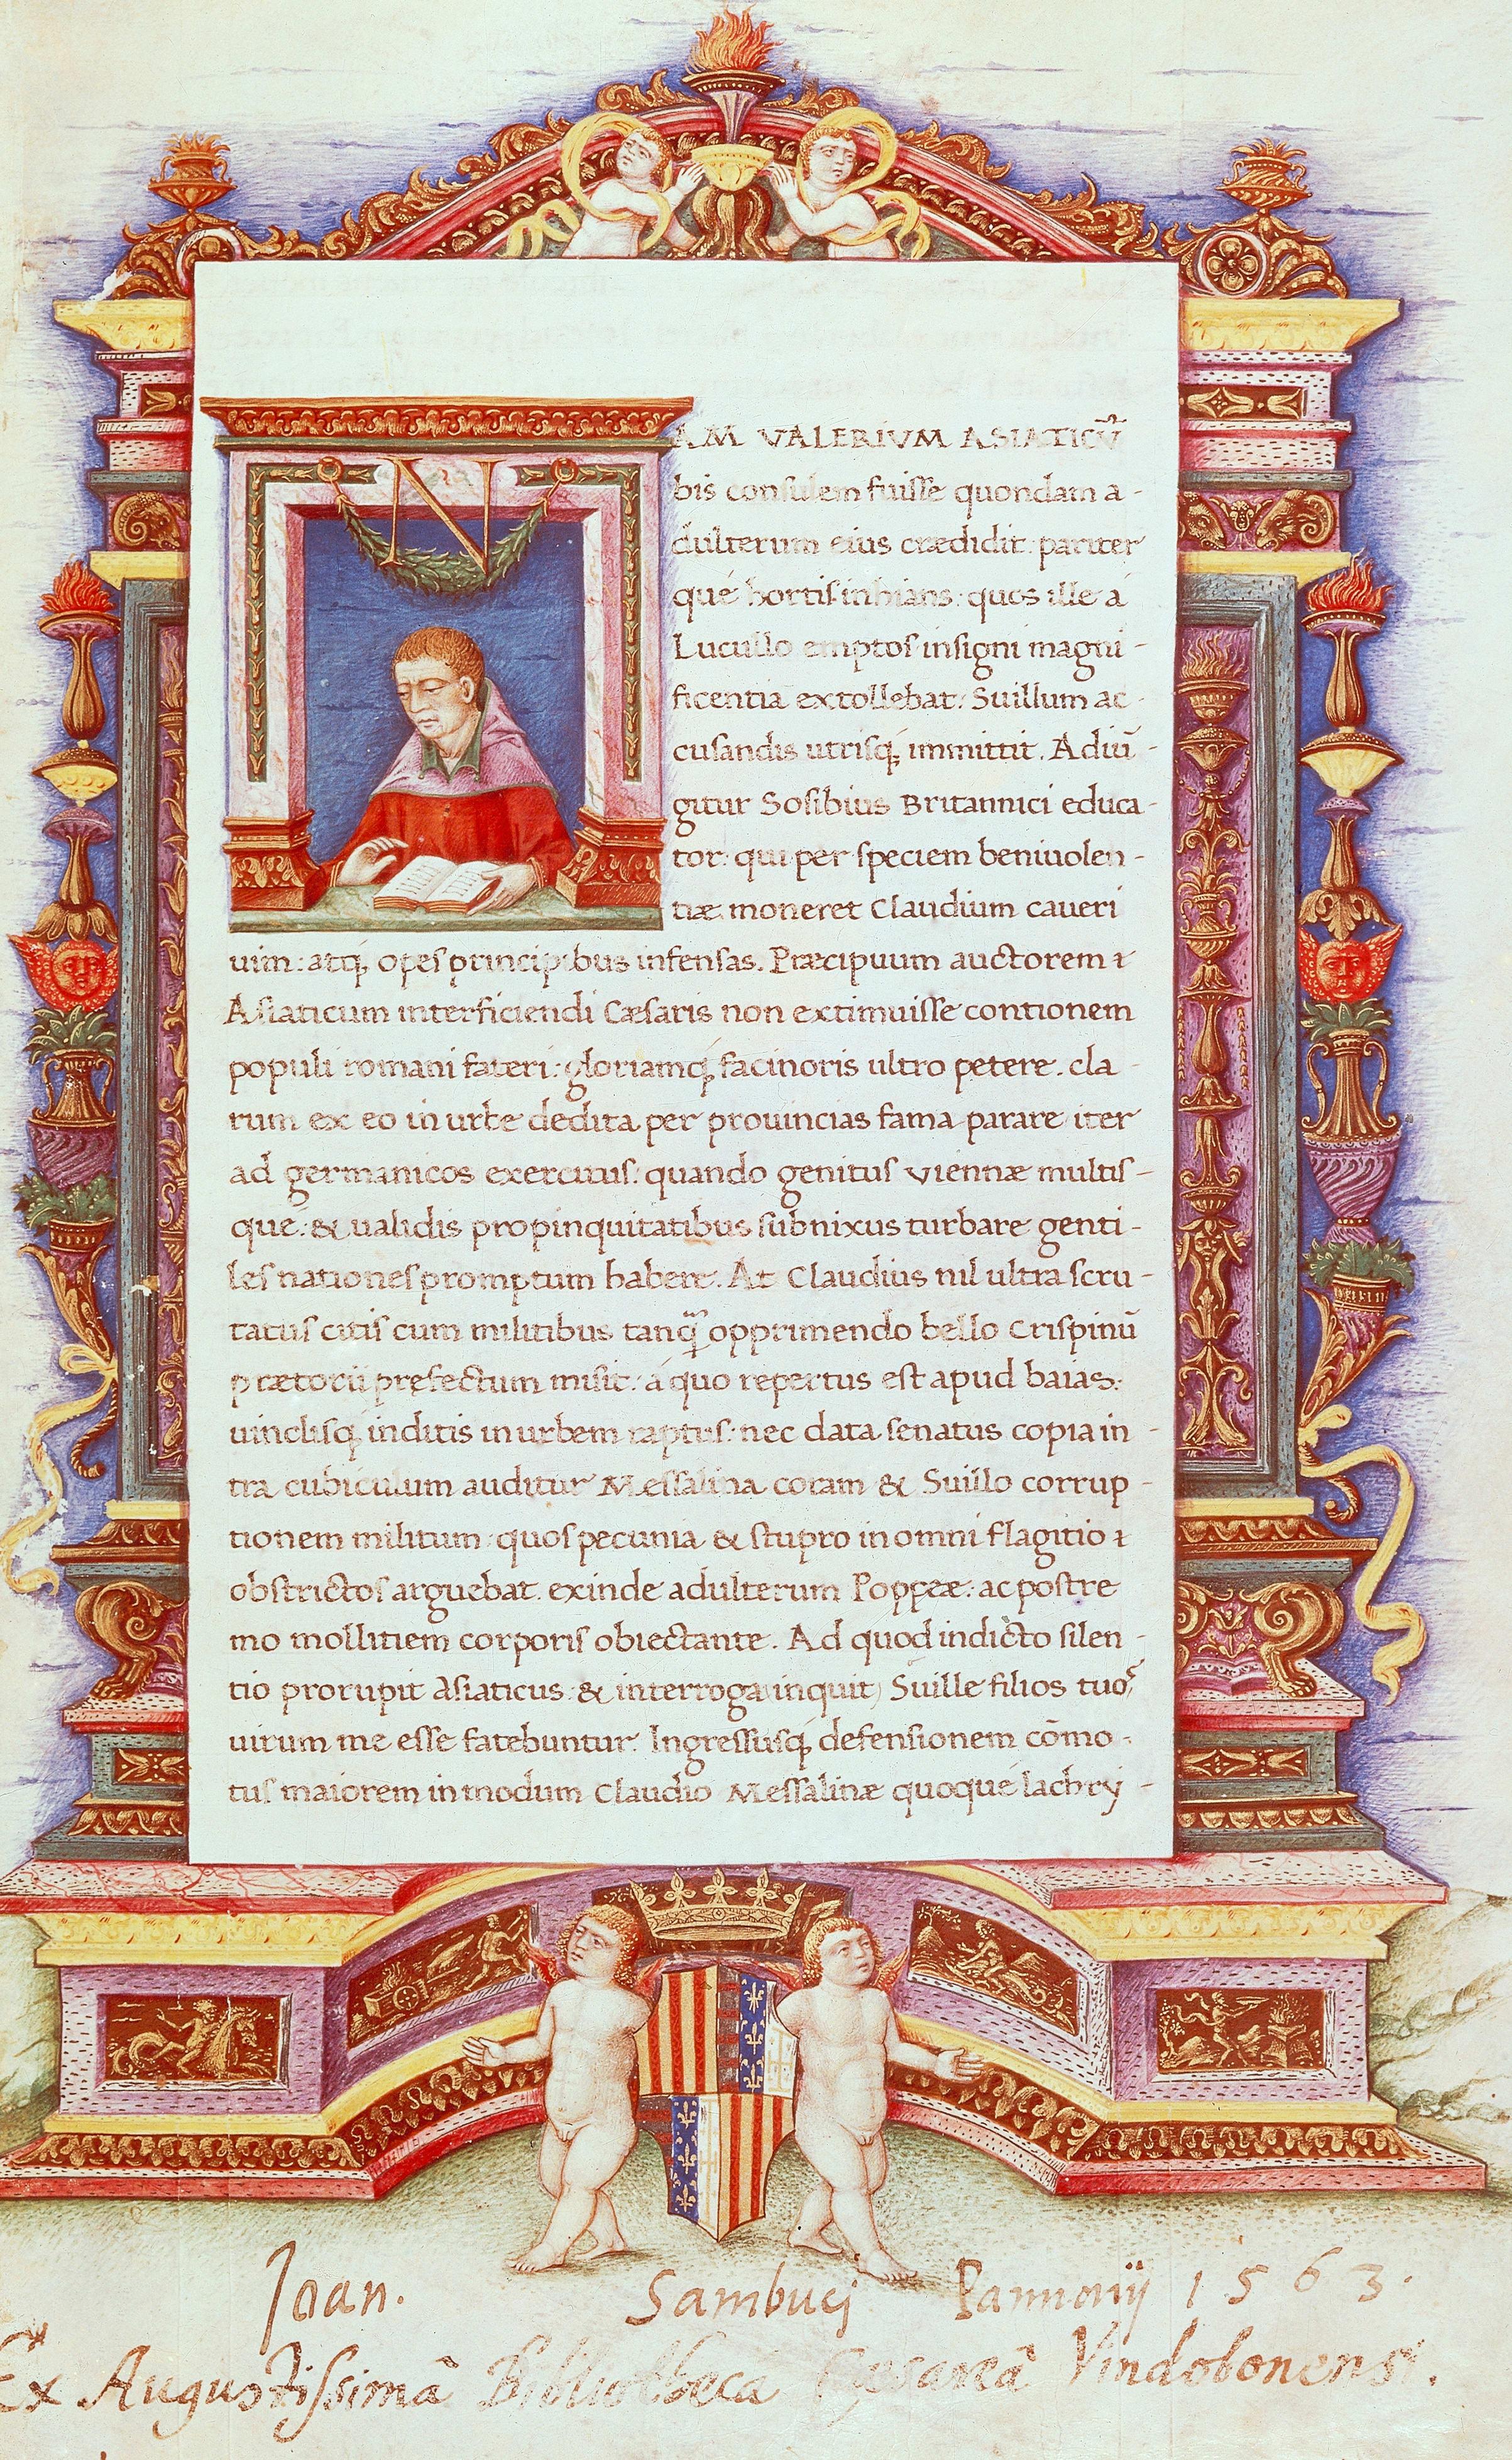 Image showing a Latin text manuscript